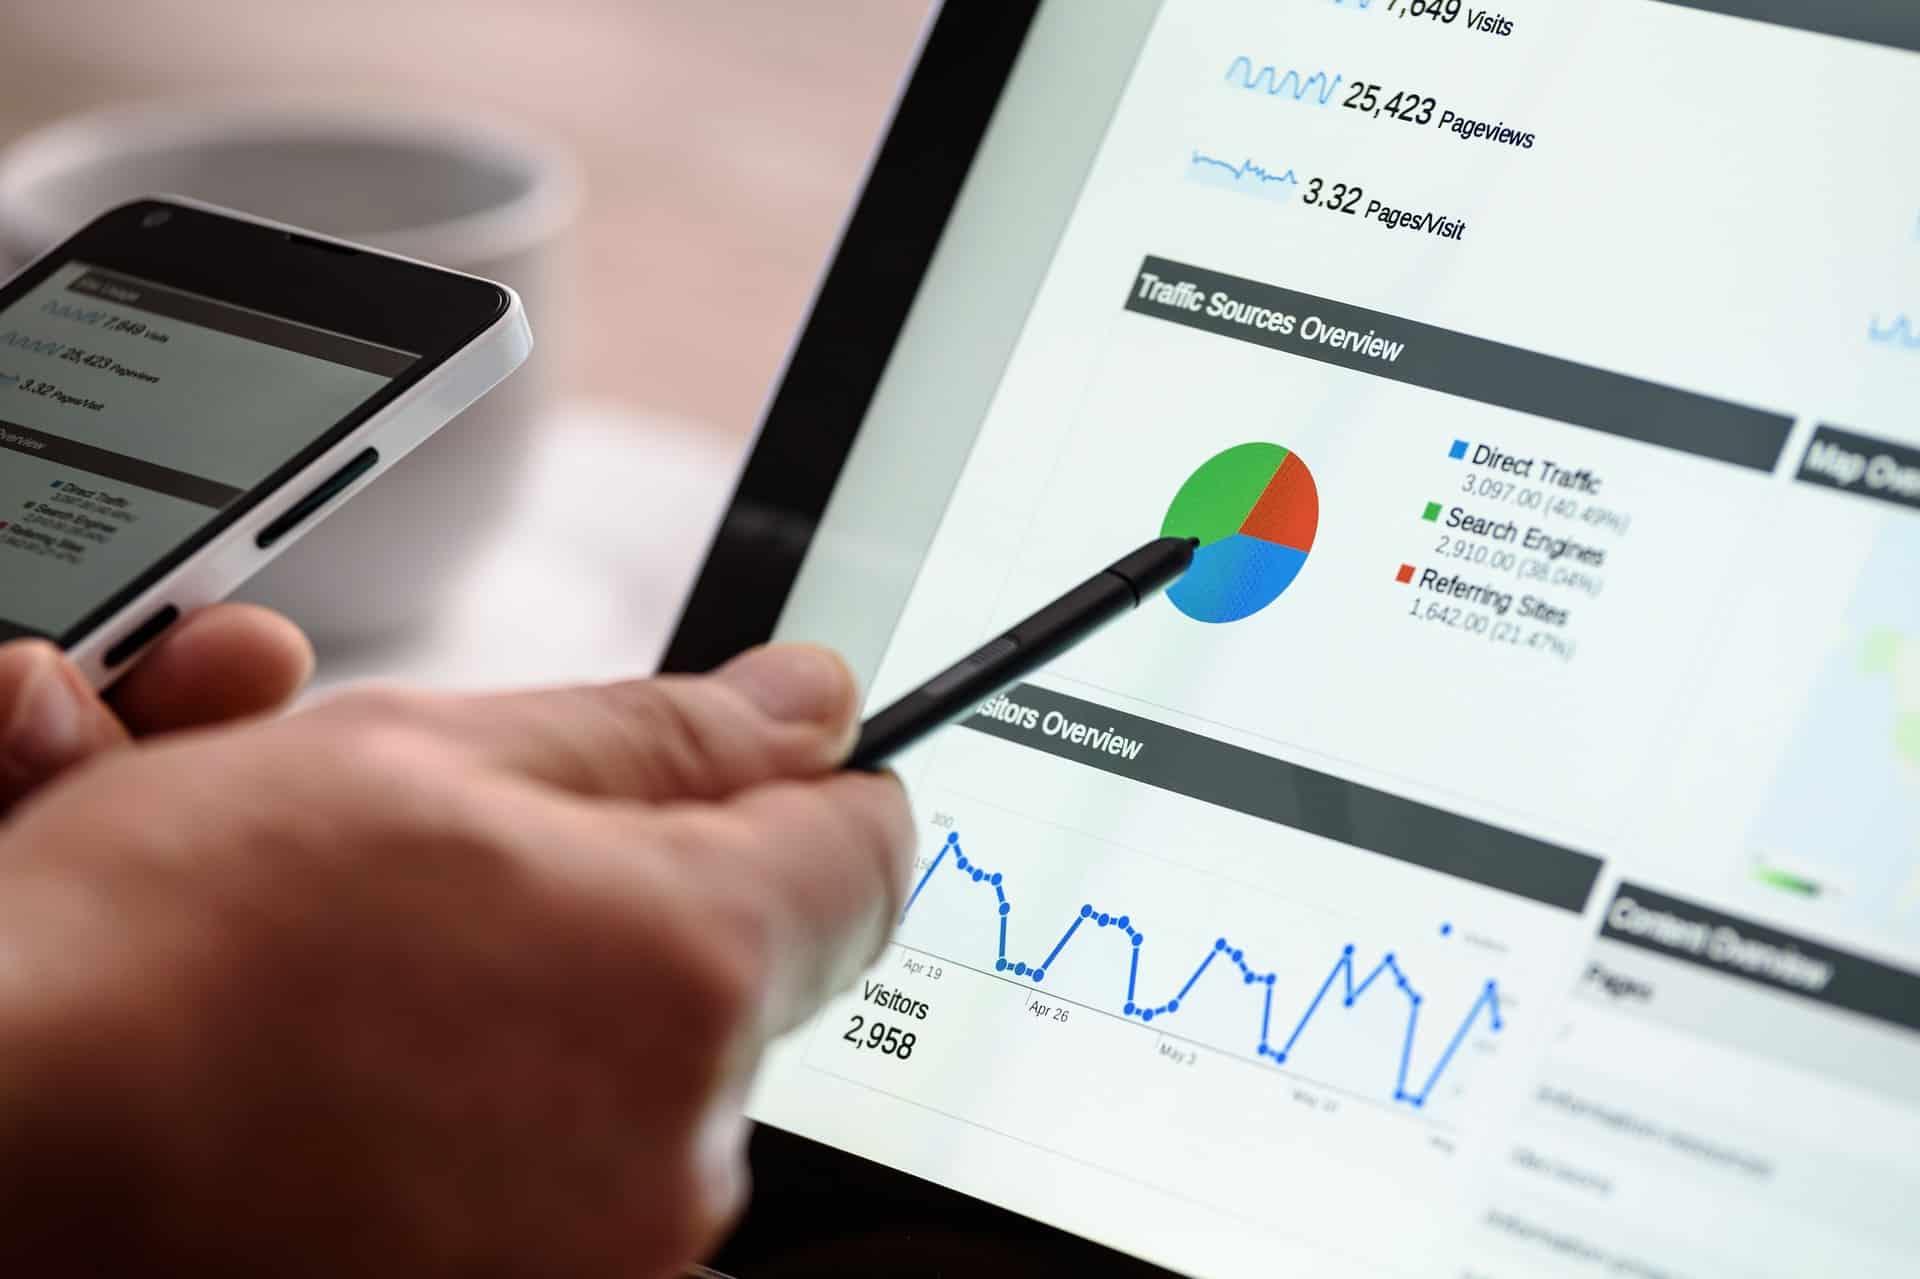 Seo Audit - Search Engine Optimization